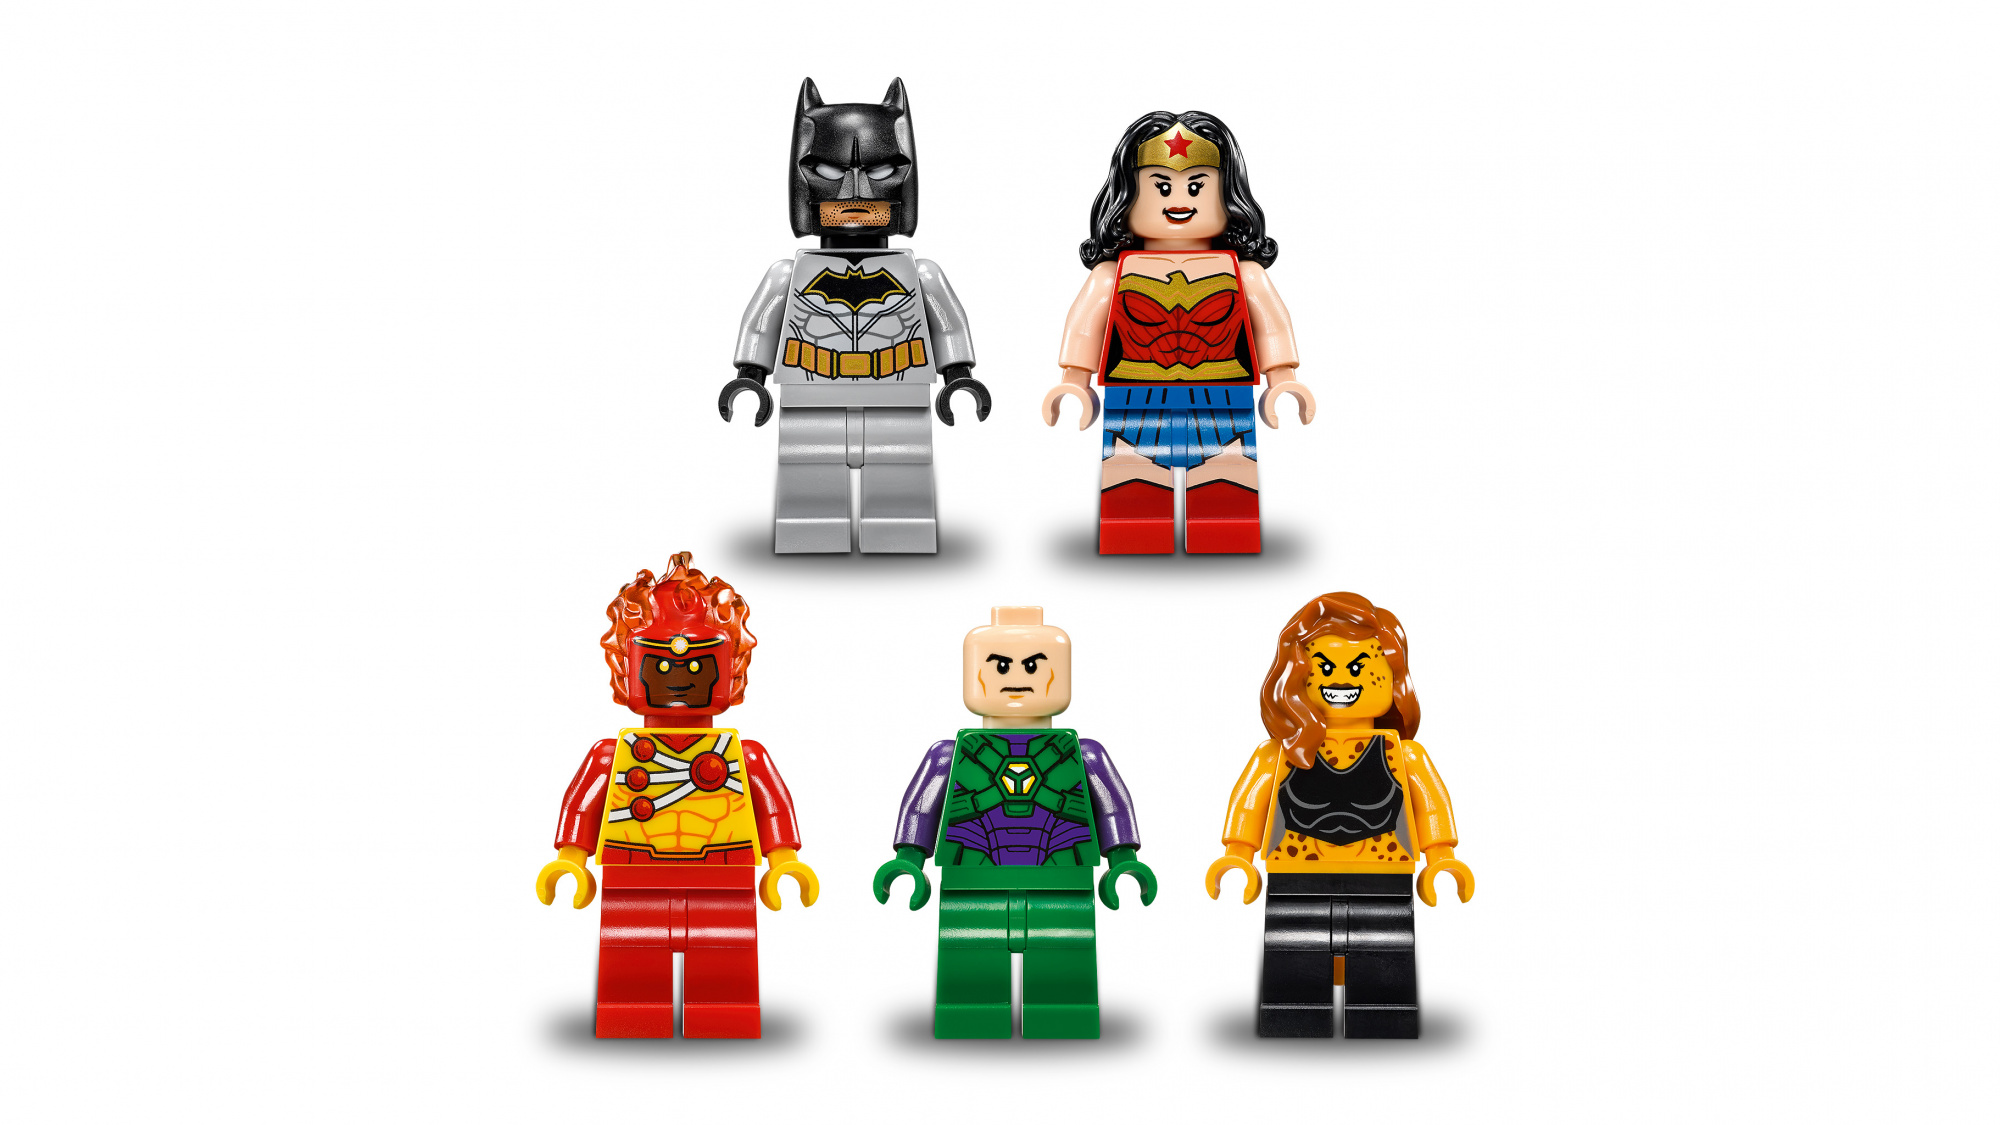 LEGO Superheroes™ Batman minifig from 76097